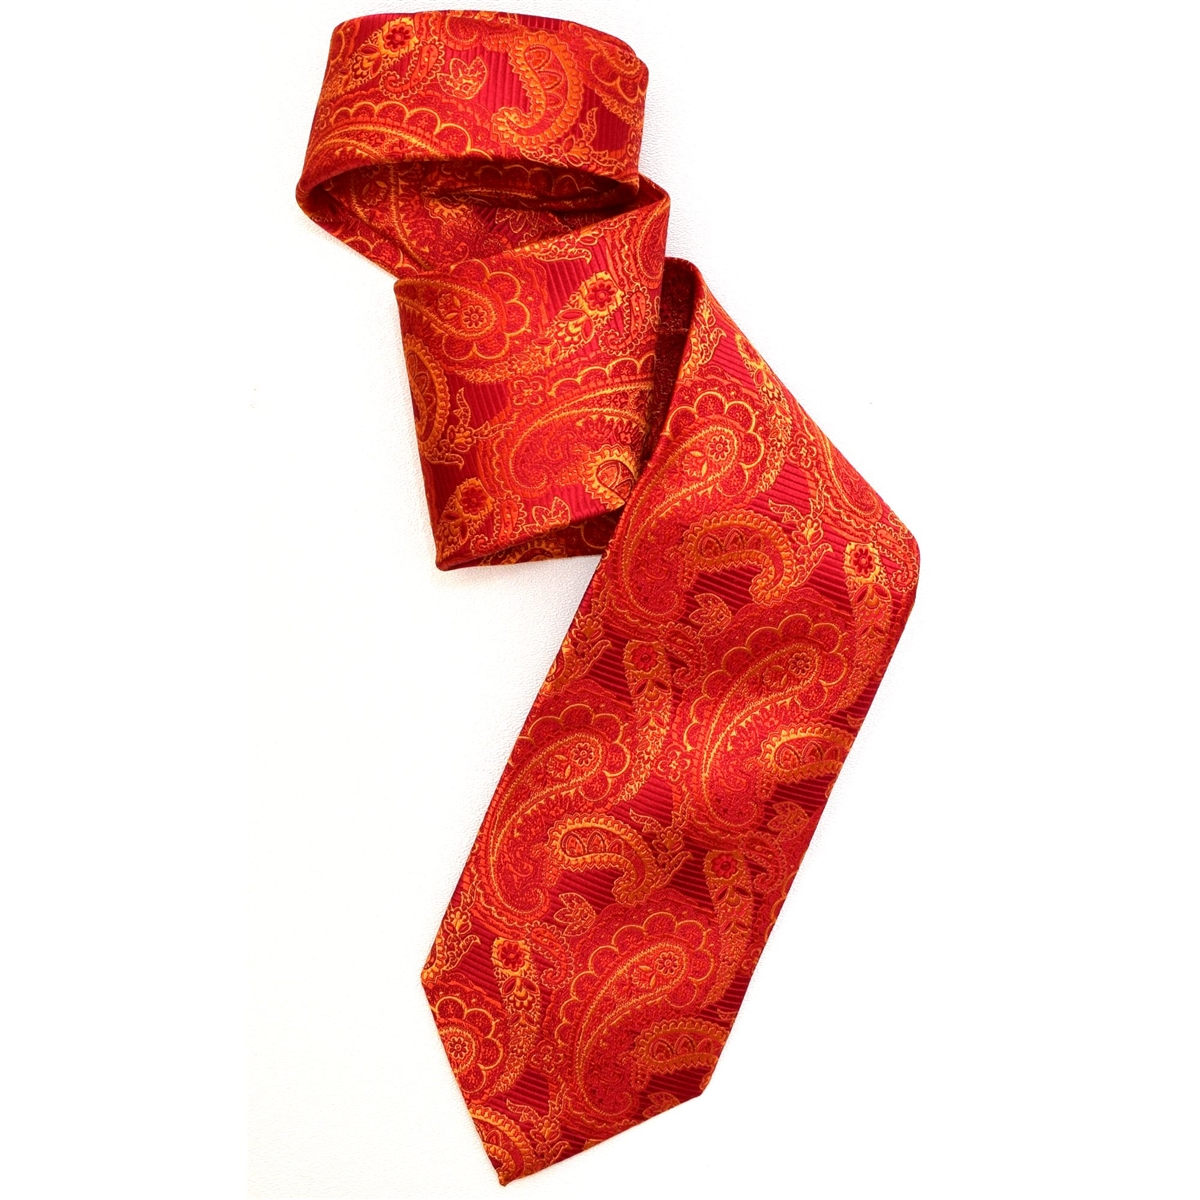 Robert Talbott Red Floral Paisley Best Of Class Tie